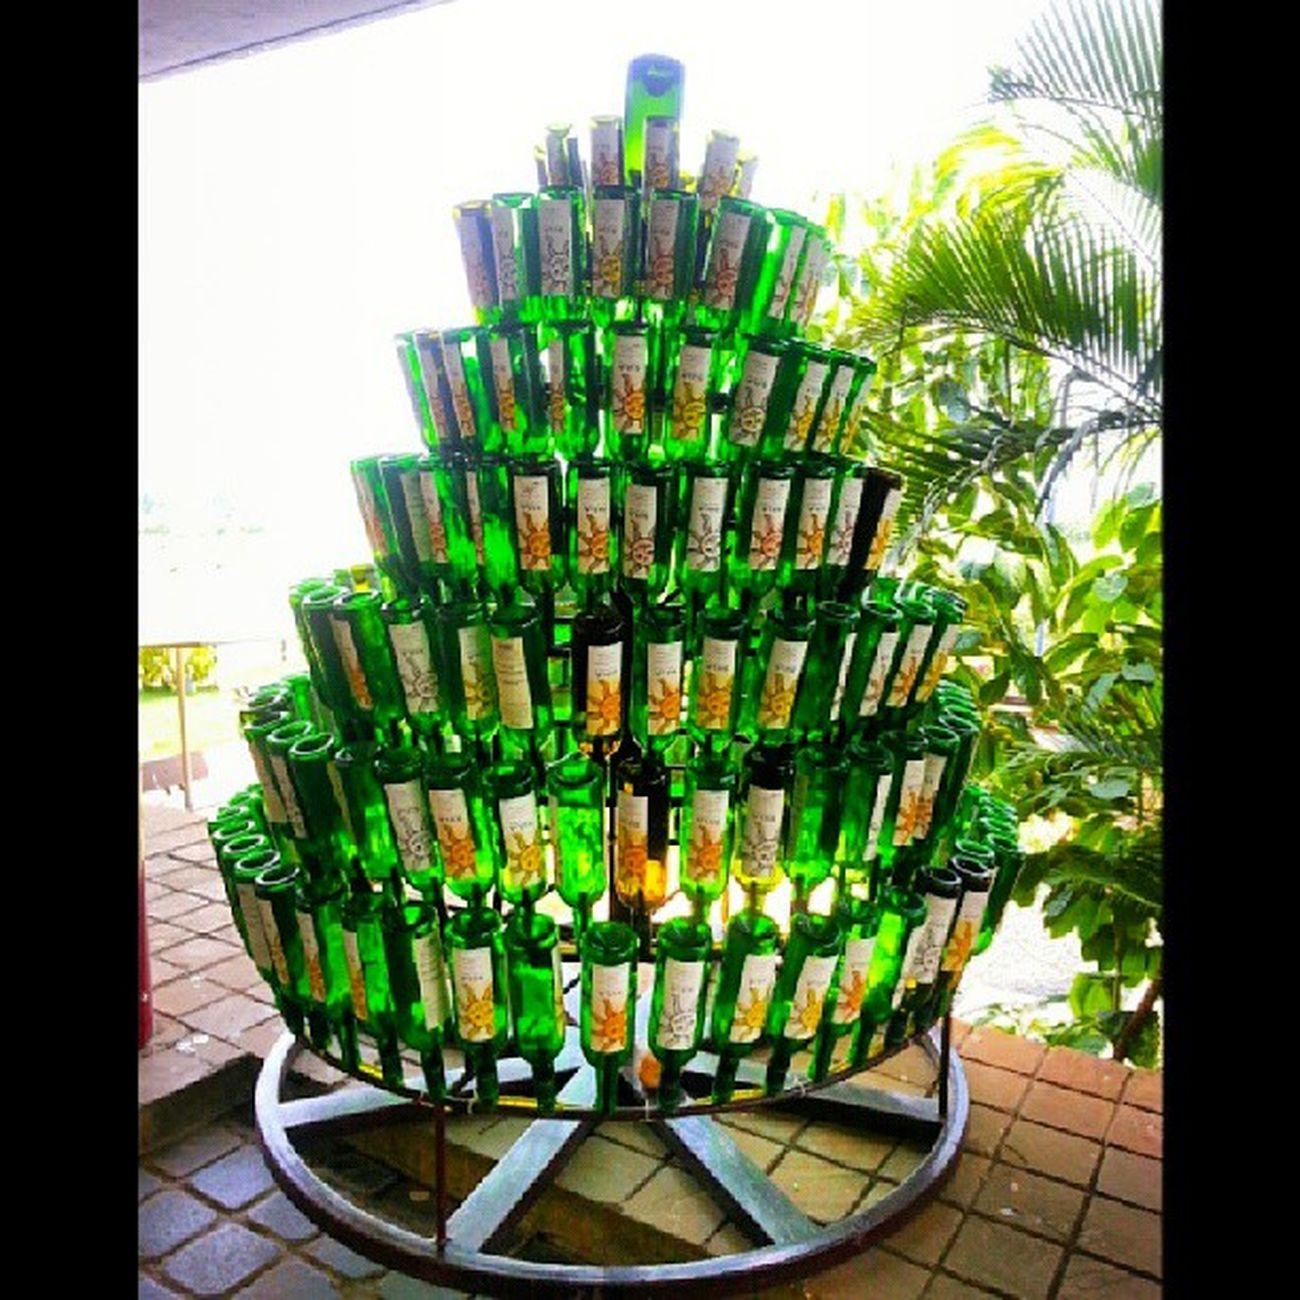 Very Creative use of old Glass bottles Pixoddinary Pixoddinary_c5 igersmumbai trash converted to art